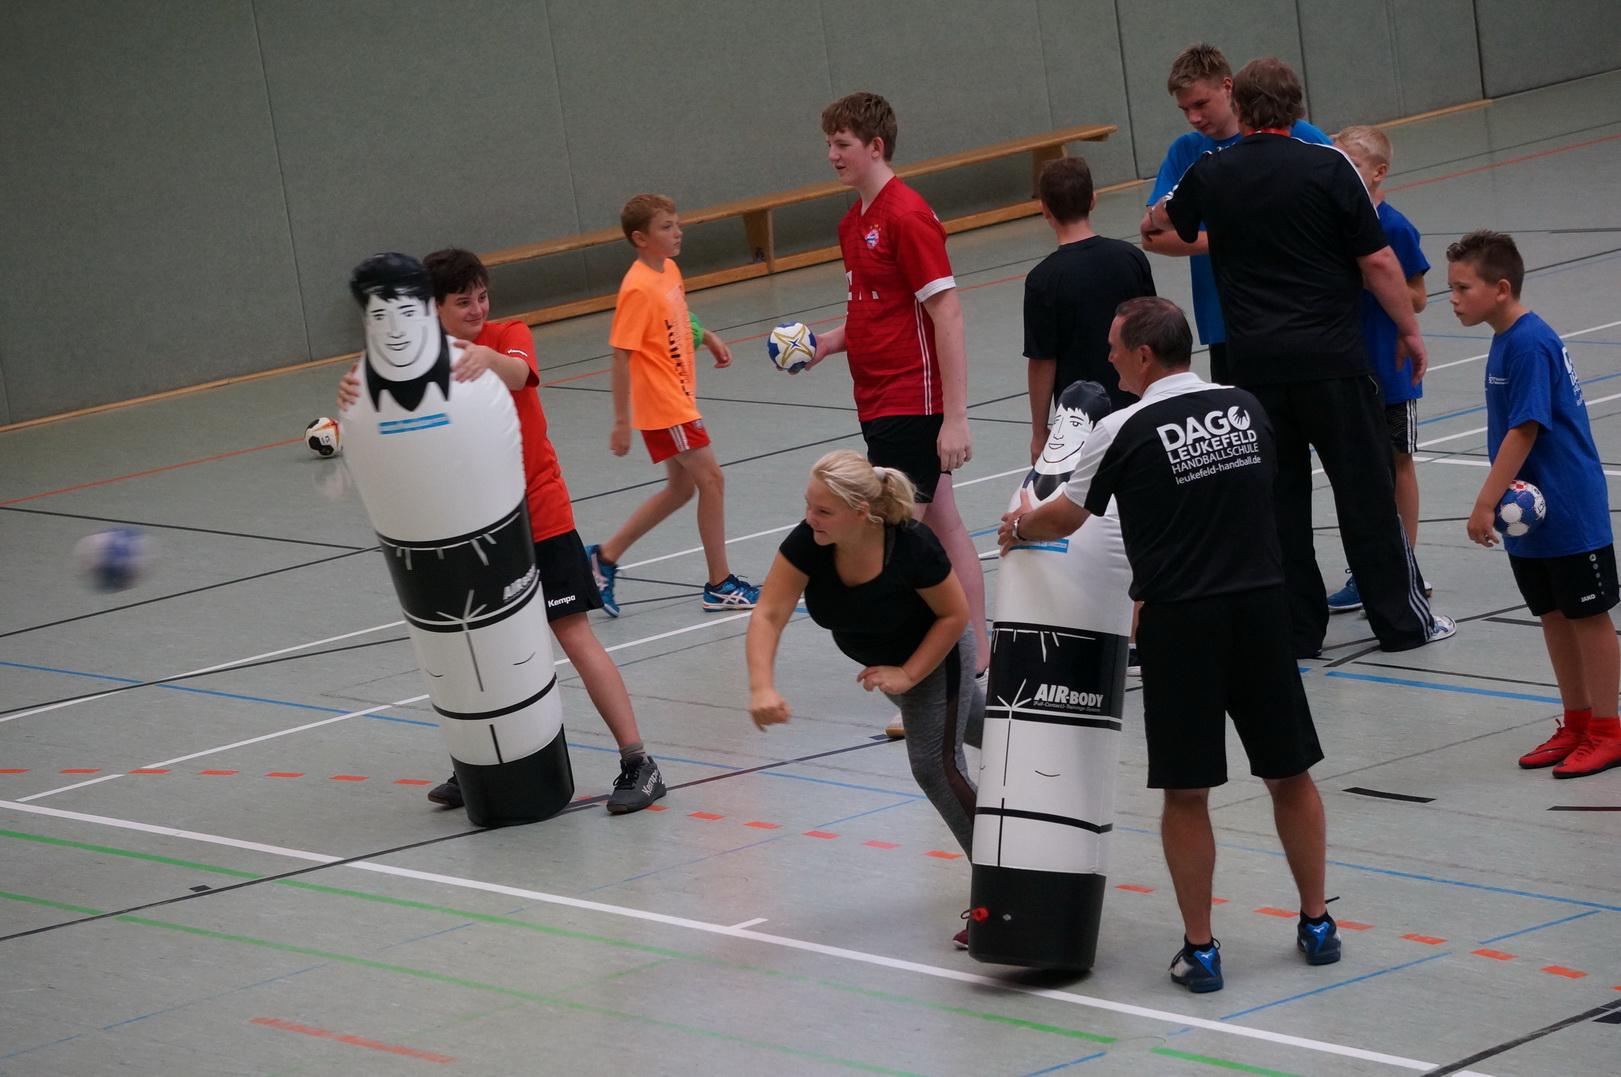 201808_Handballcamp_SDH_MG_238w